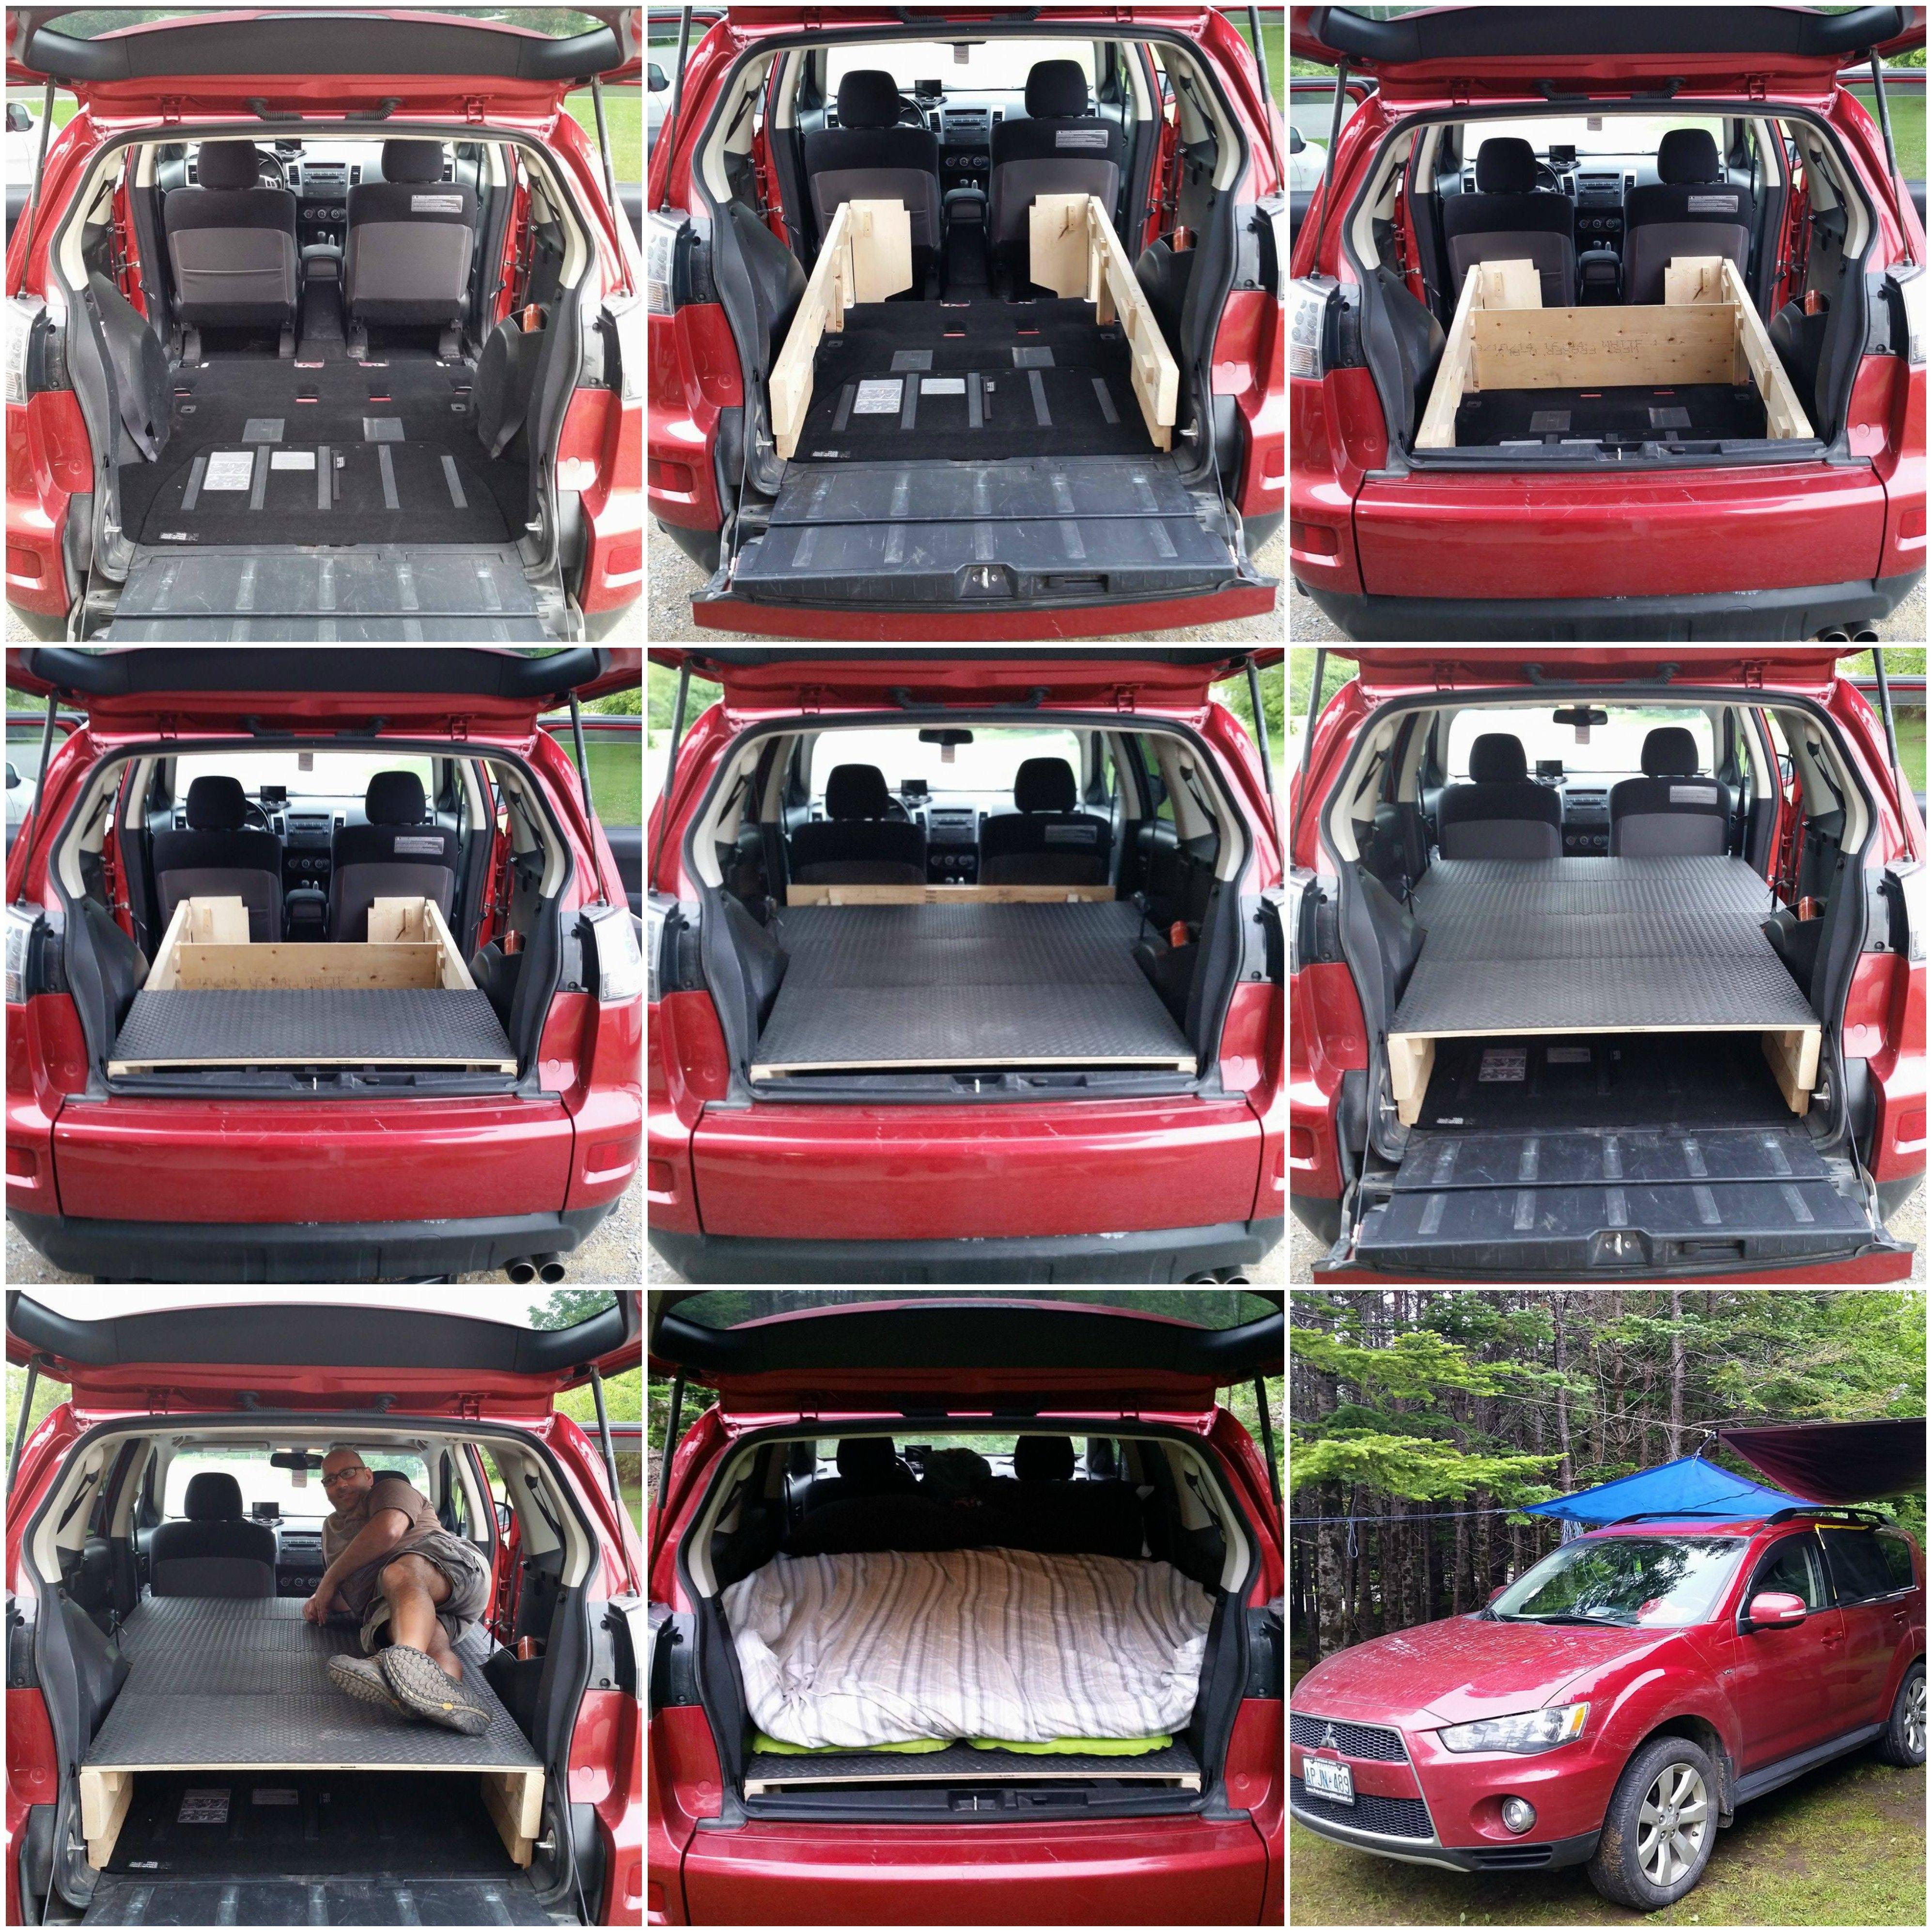 Suv Camping In Our Mitsubishi Outlander Camping Suv